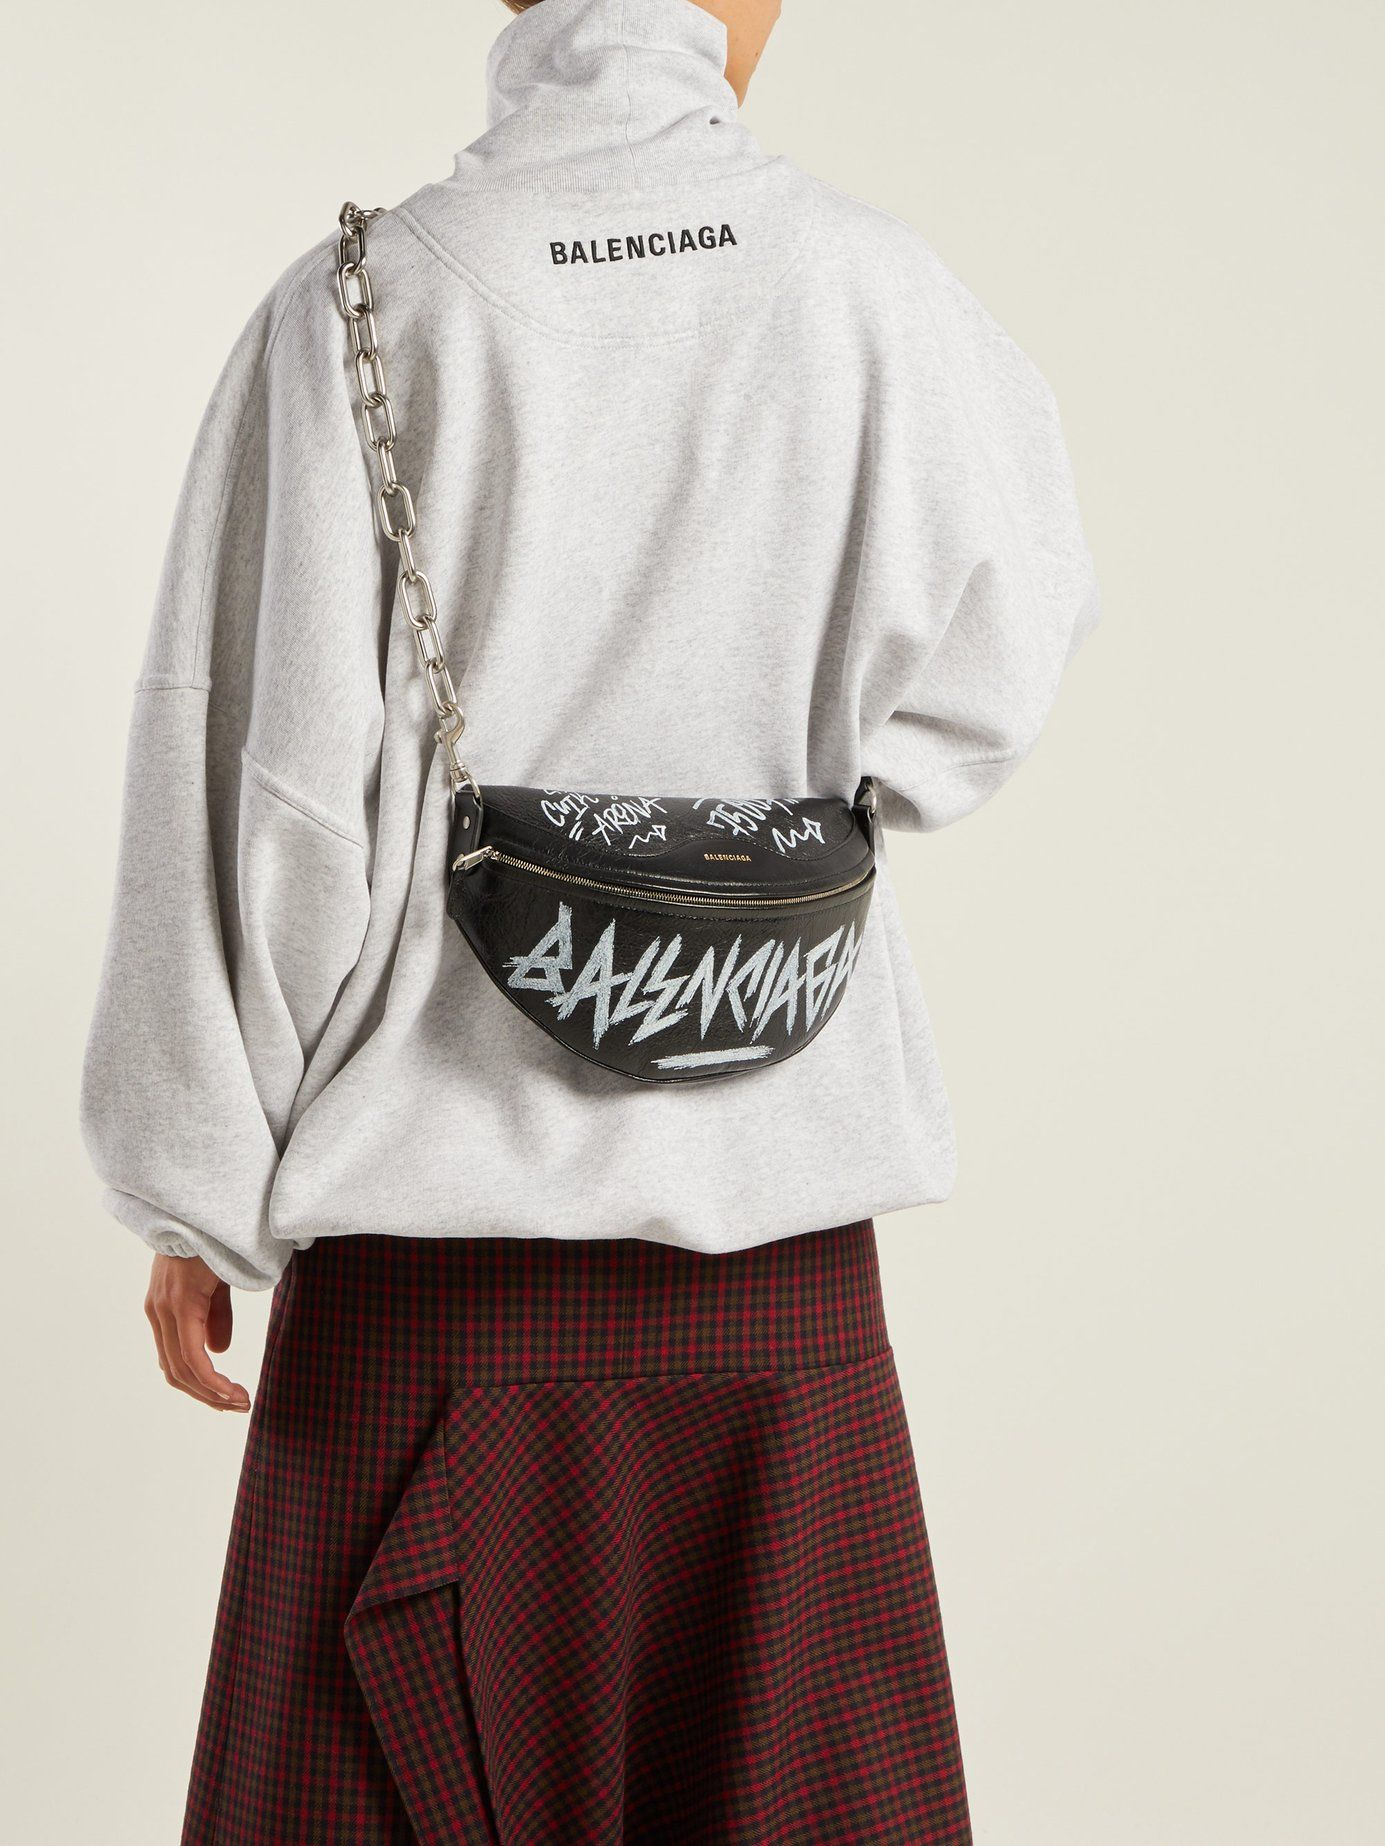 545f78f3235e Souvenir graffiti-print leather bag